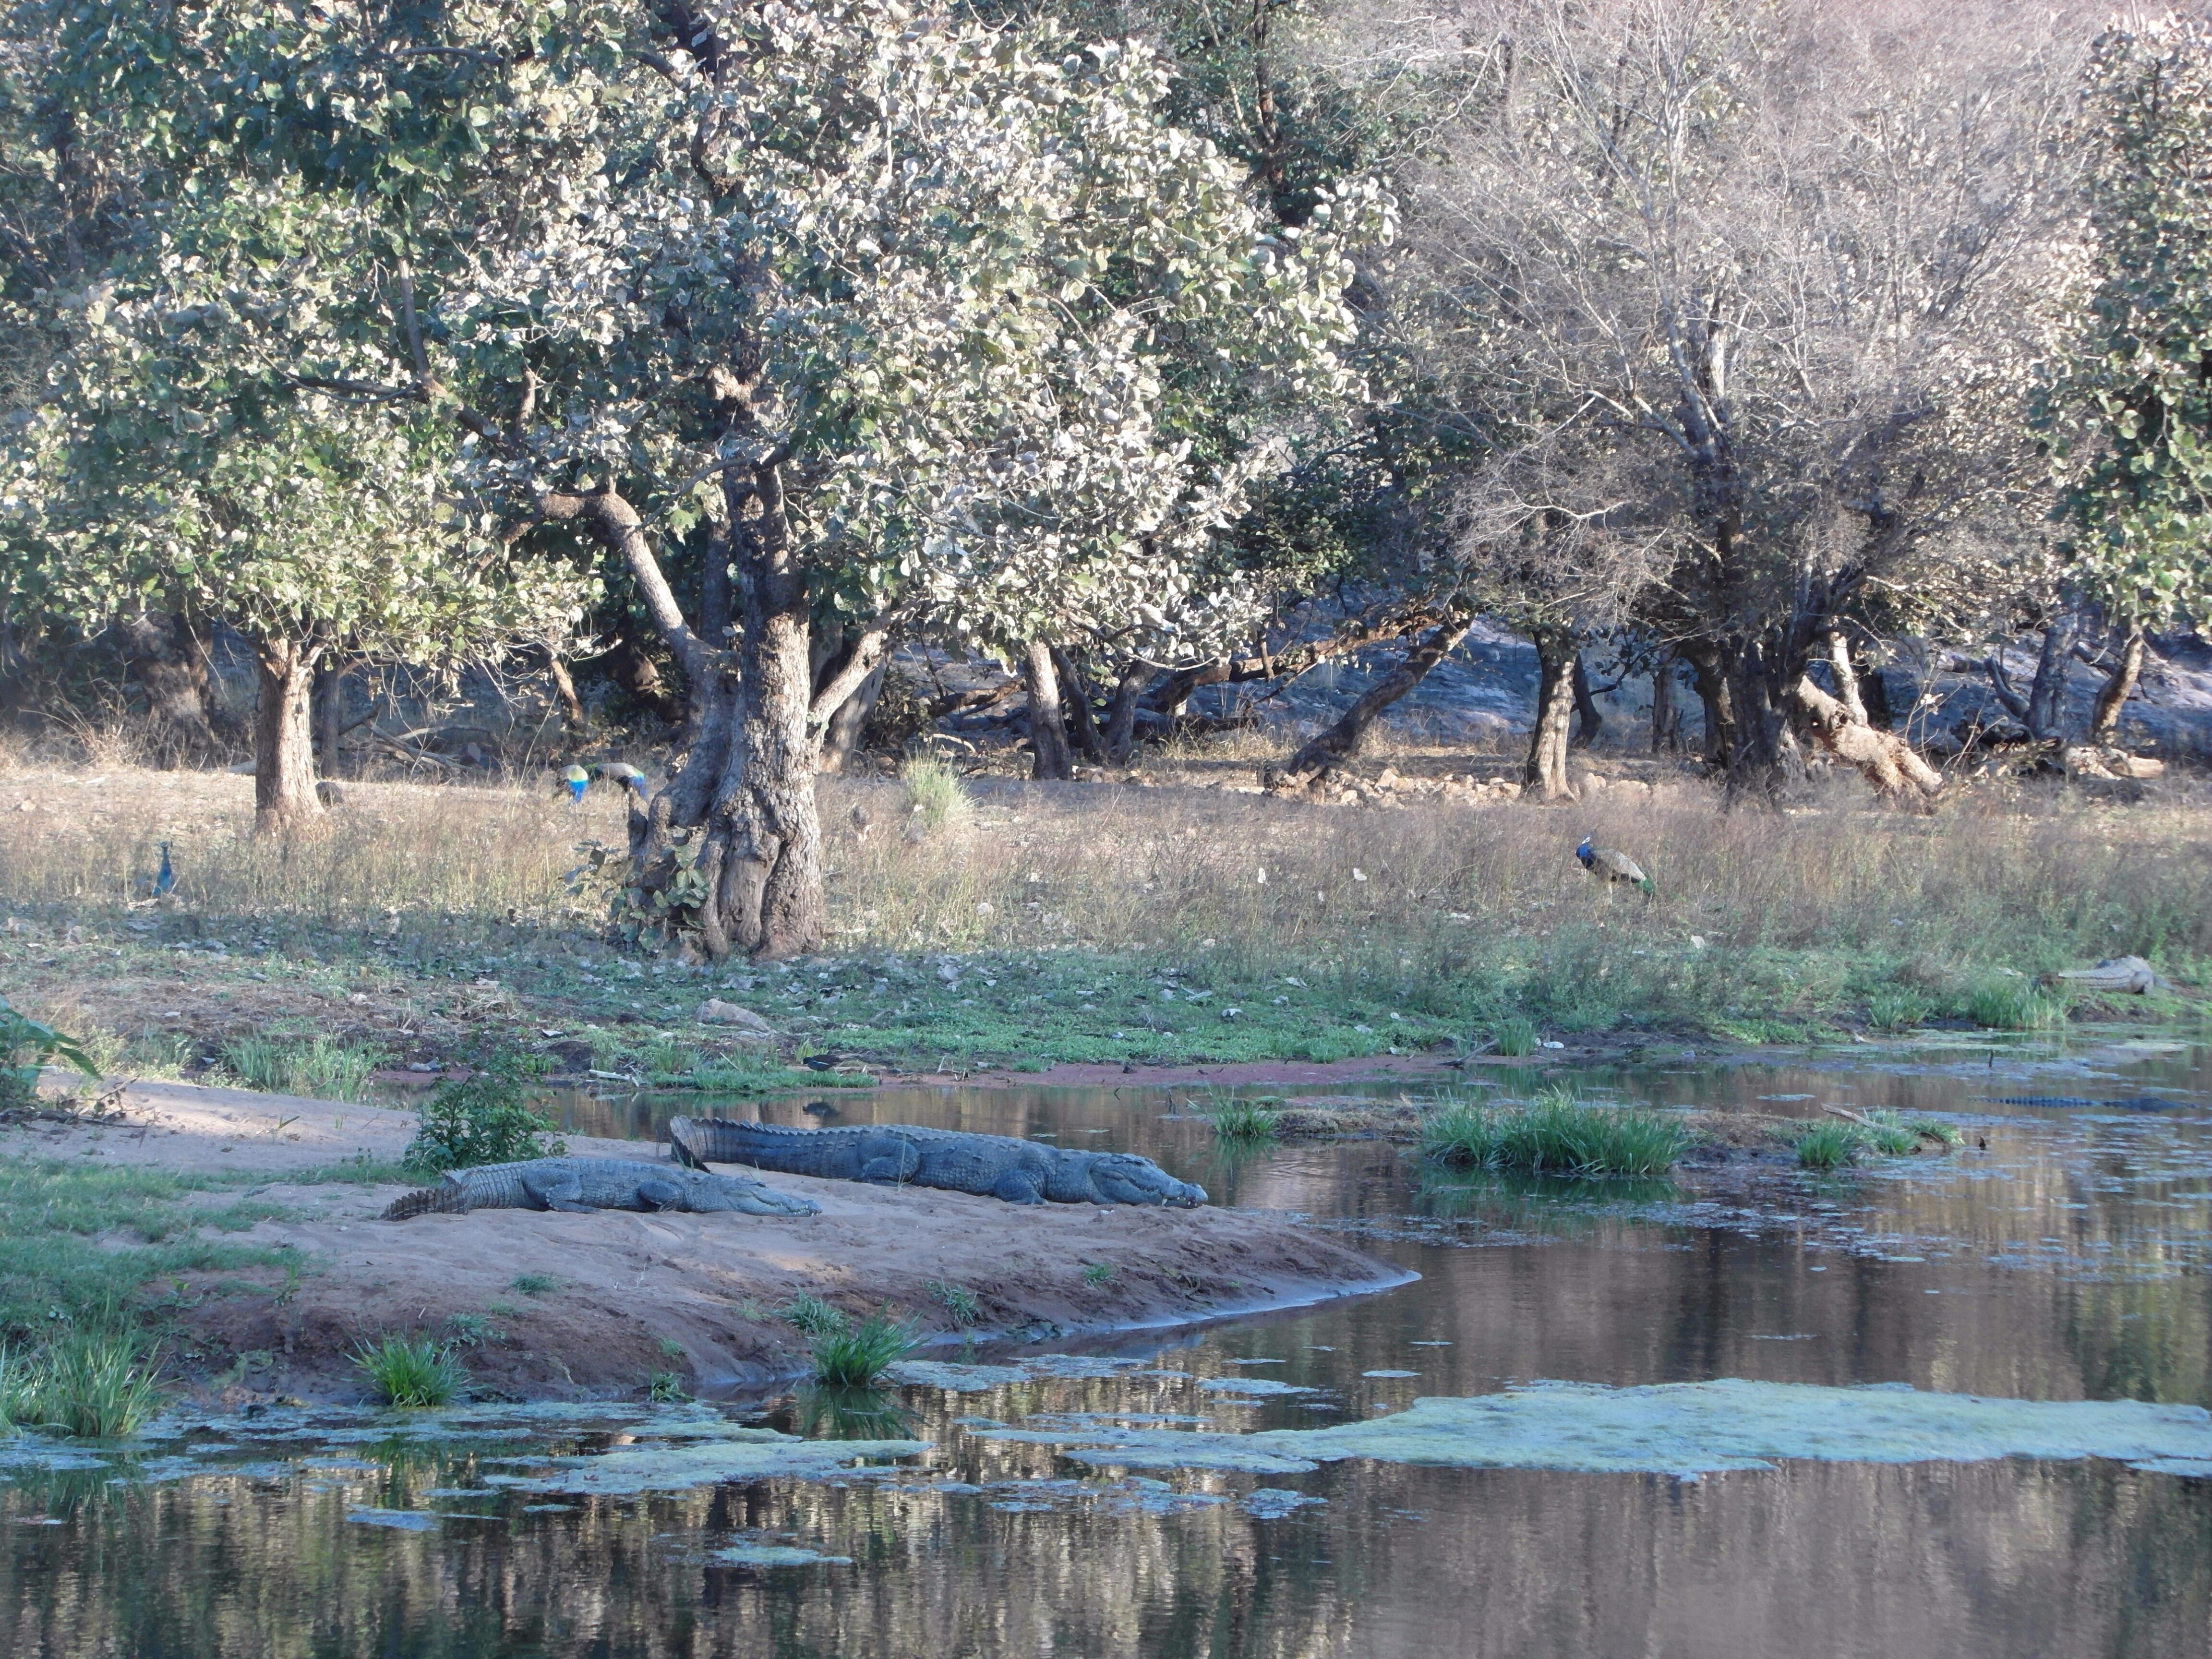 Crocodiles and peacocks at the Ranthambore Tiger Reserve